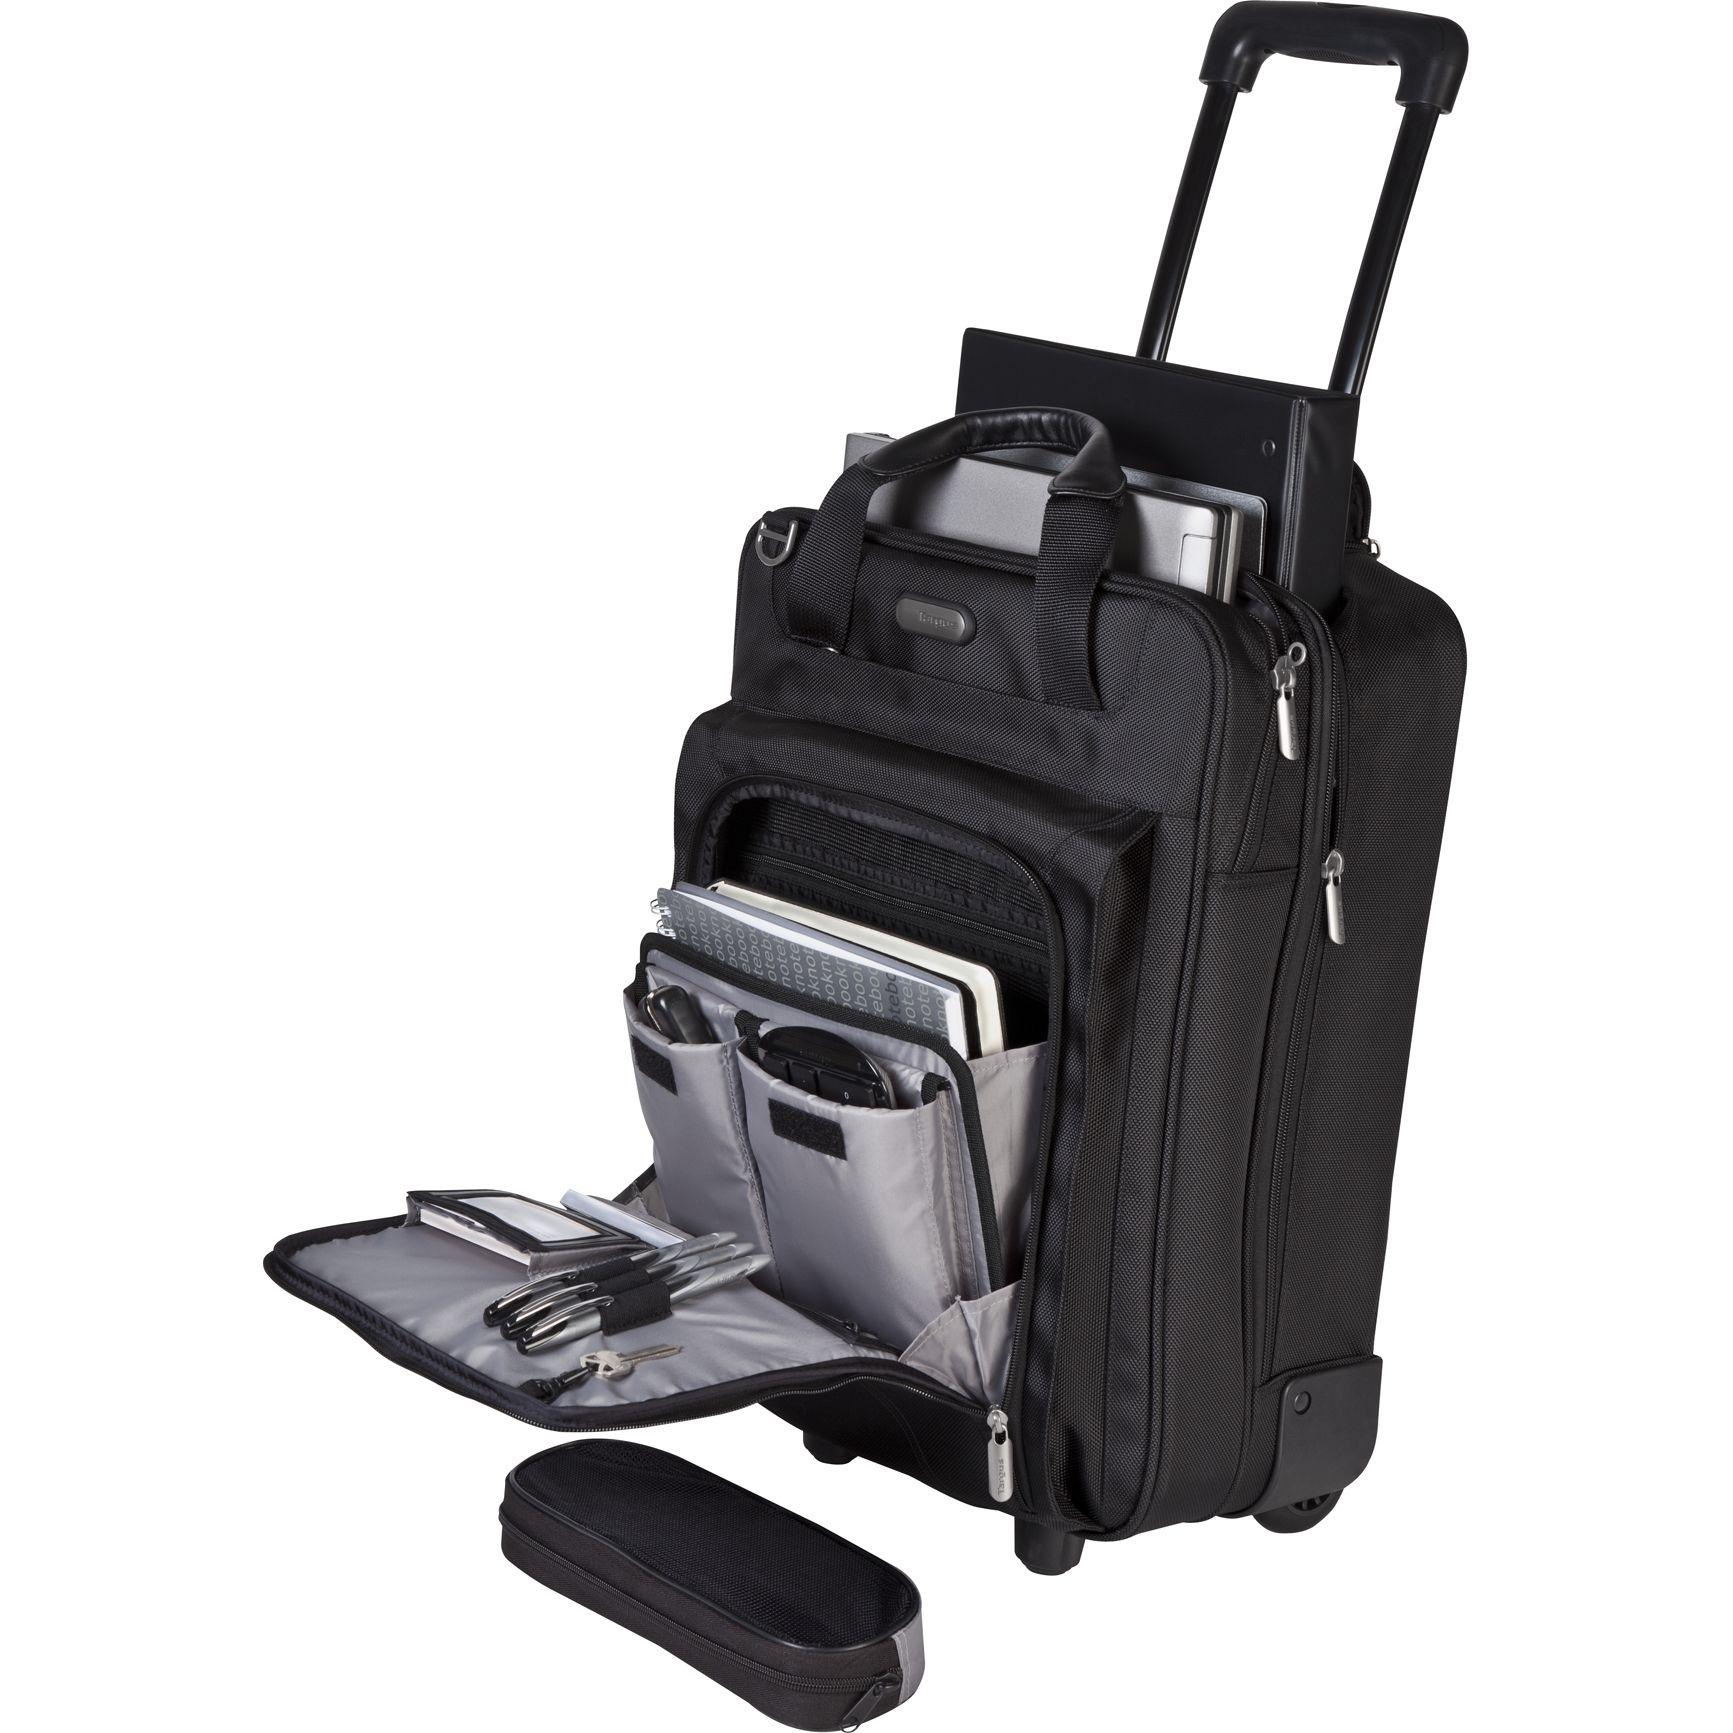 17 Corporate Traveler Vertical Rolling Laptop Case Rolling Laptop Case Best Laptop Cases 17 Inch Laptop Bag